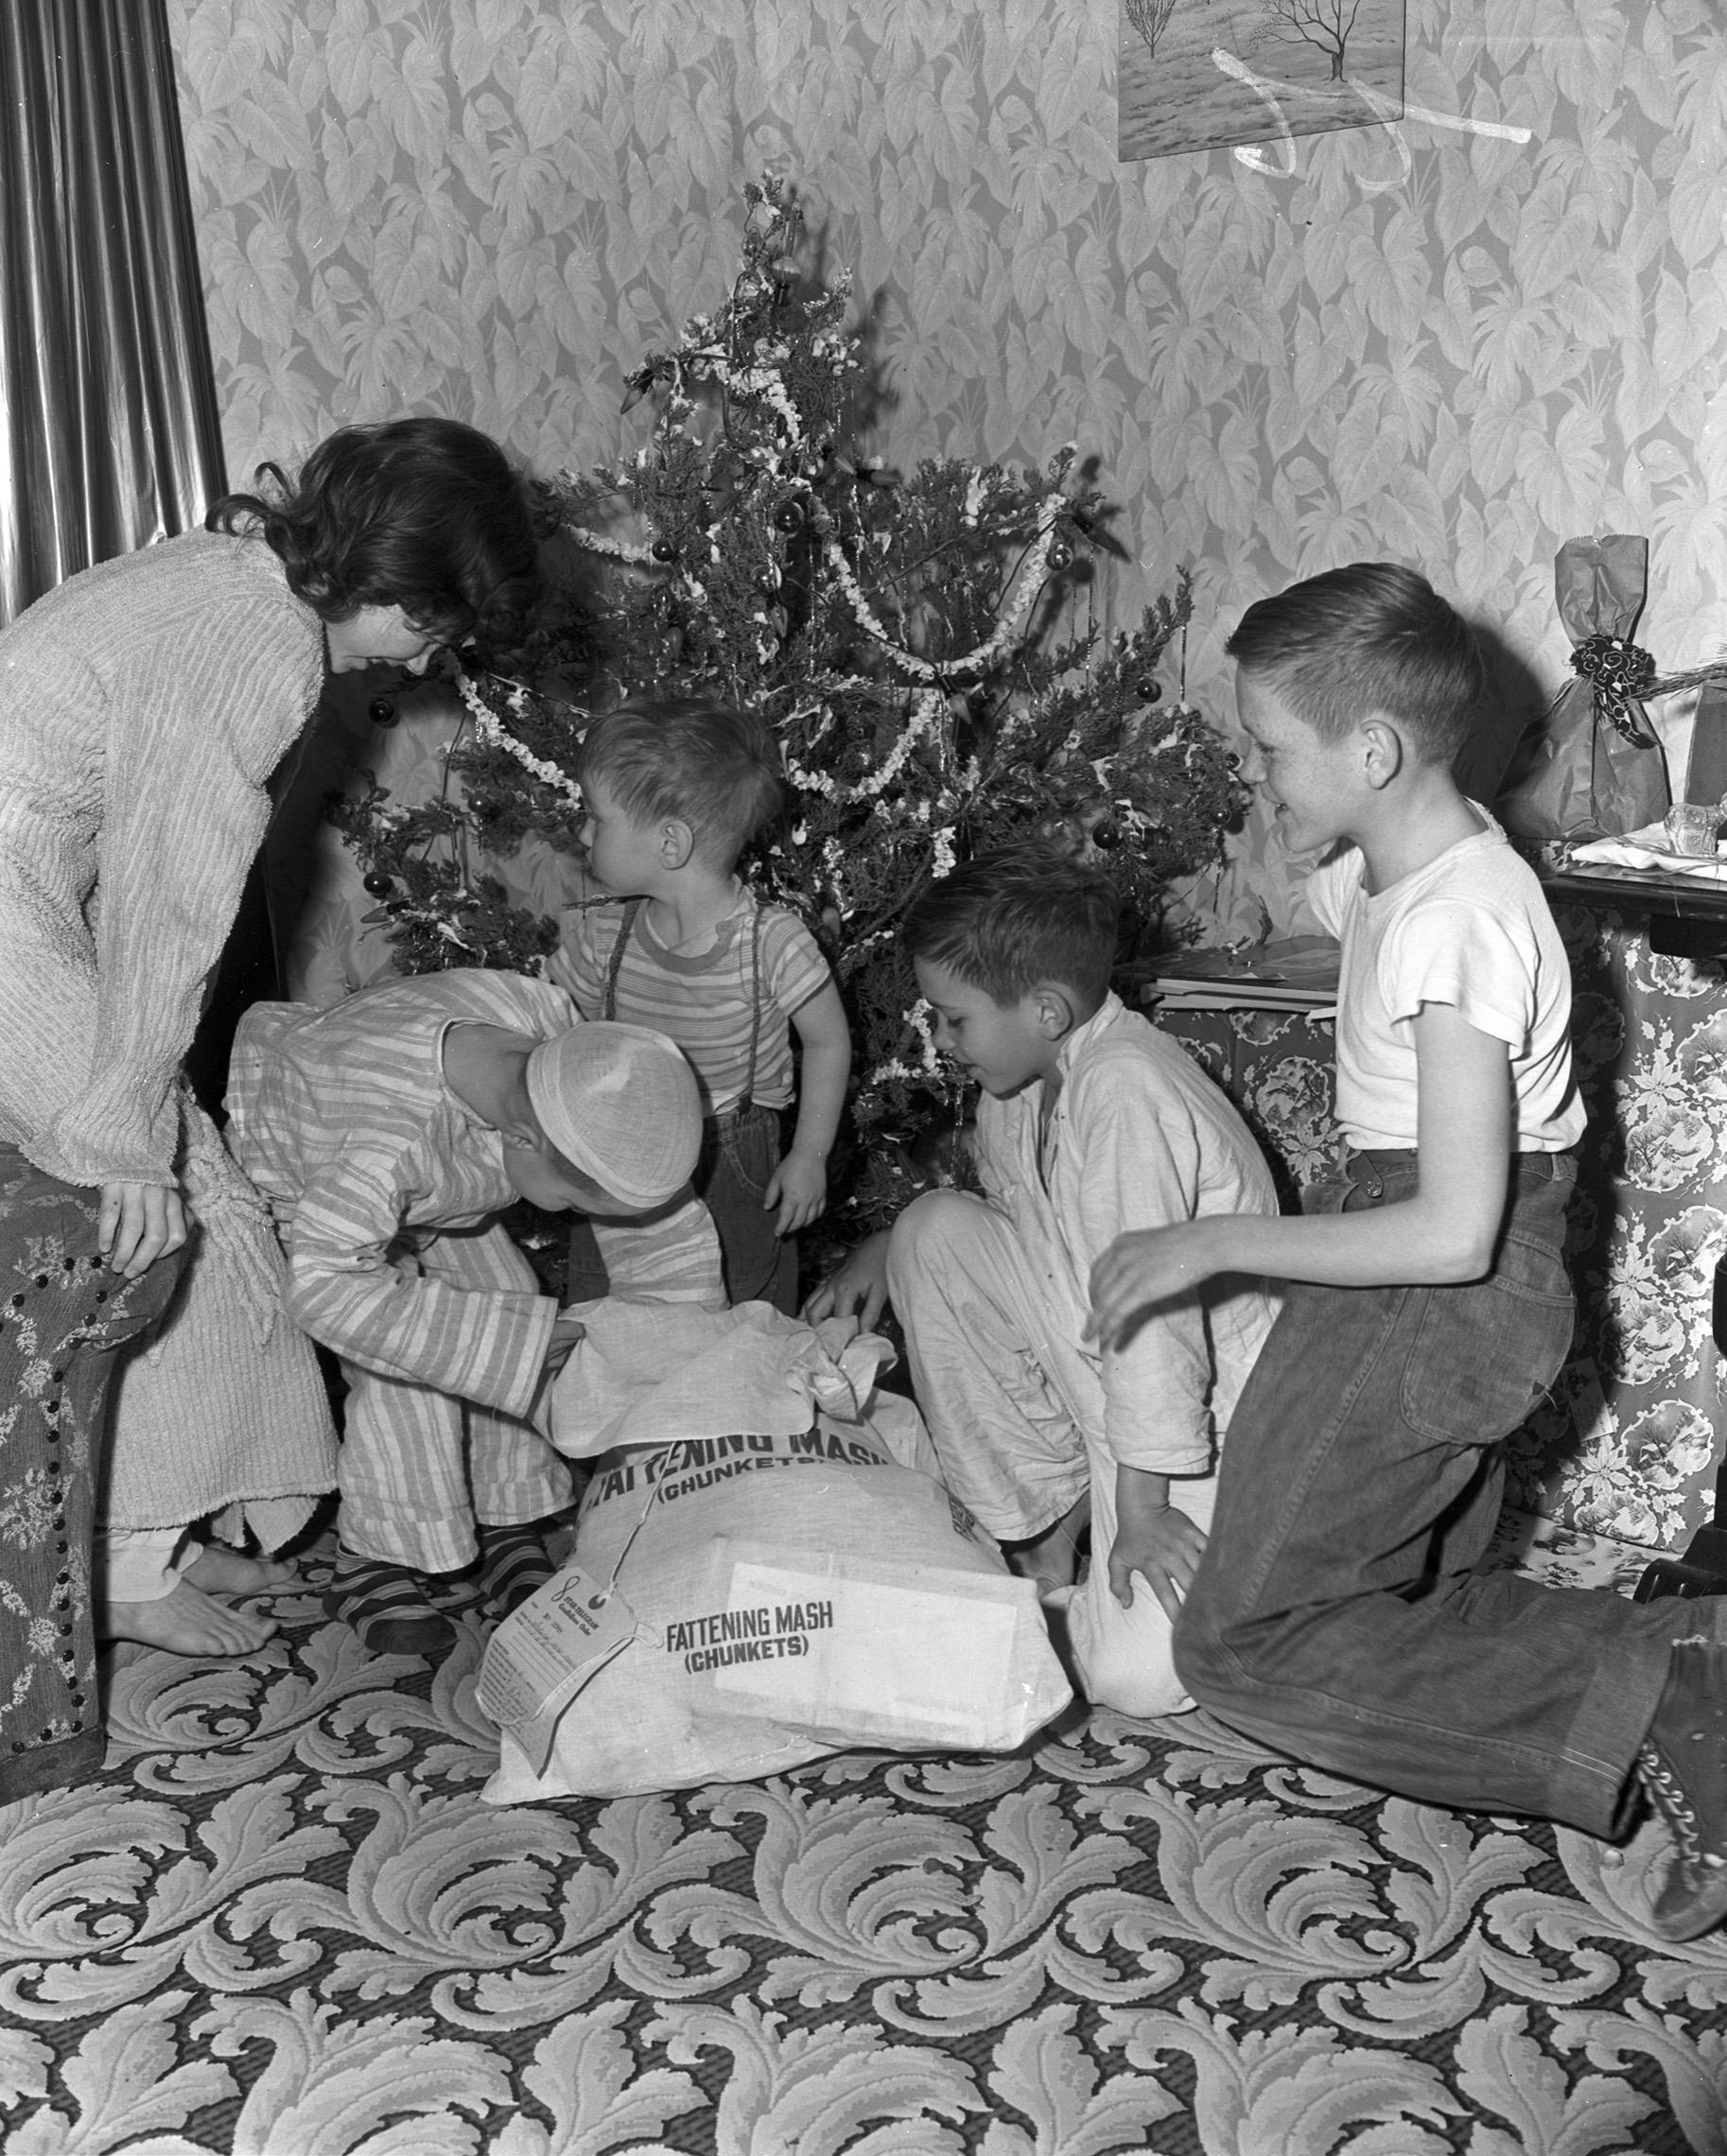 Goodfellow_Family Around Tree_1951.jpg